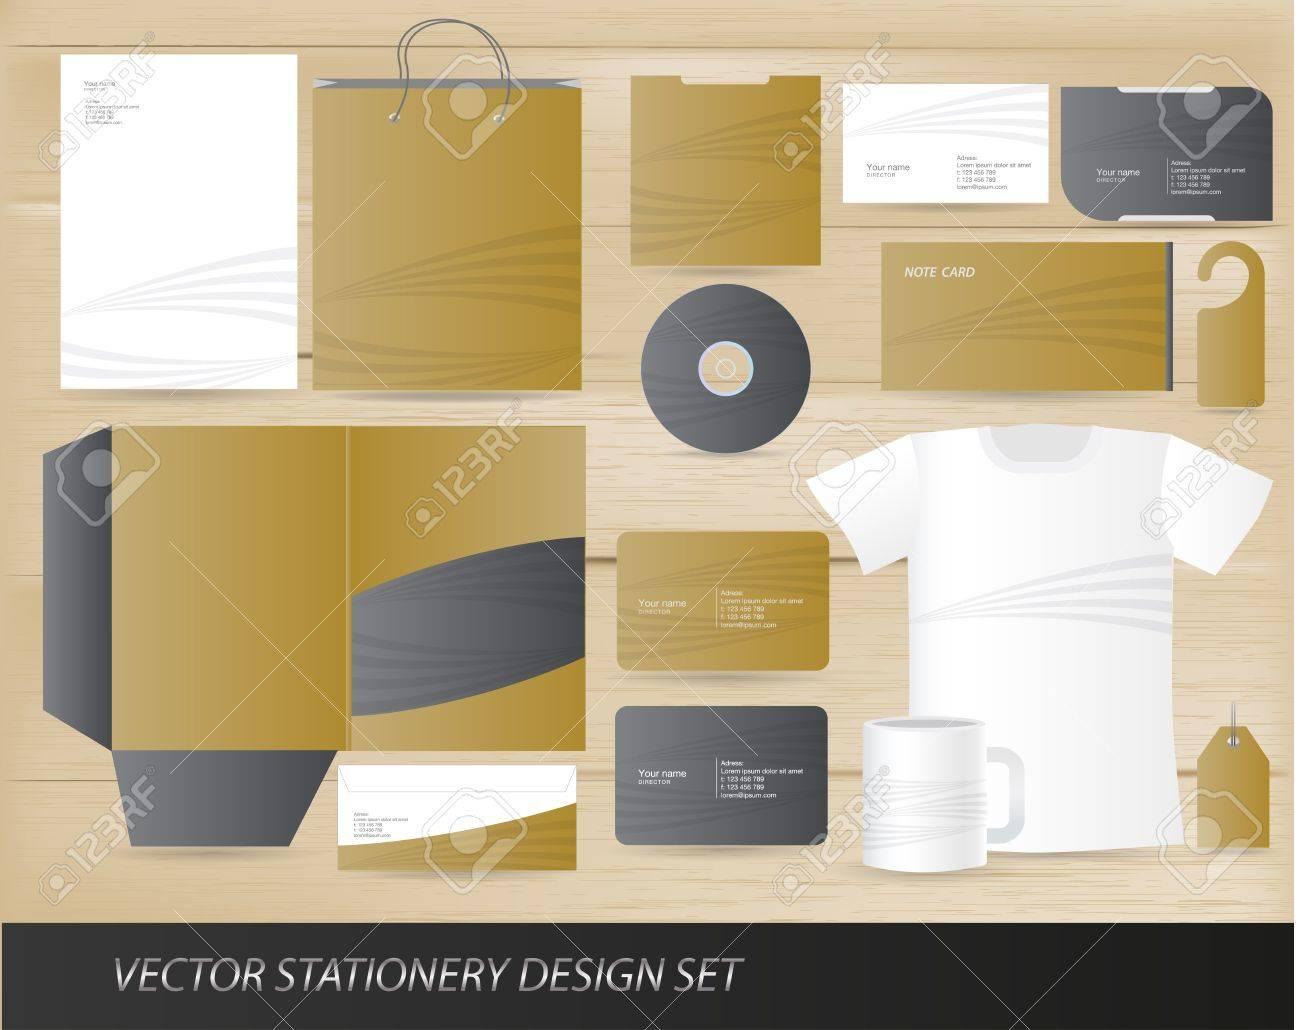 Vector stationery design set Stock Vector - 13396627